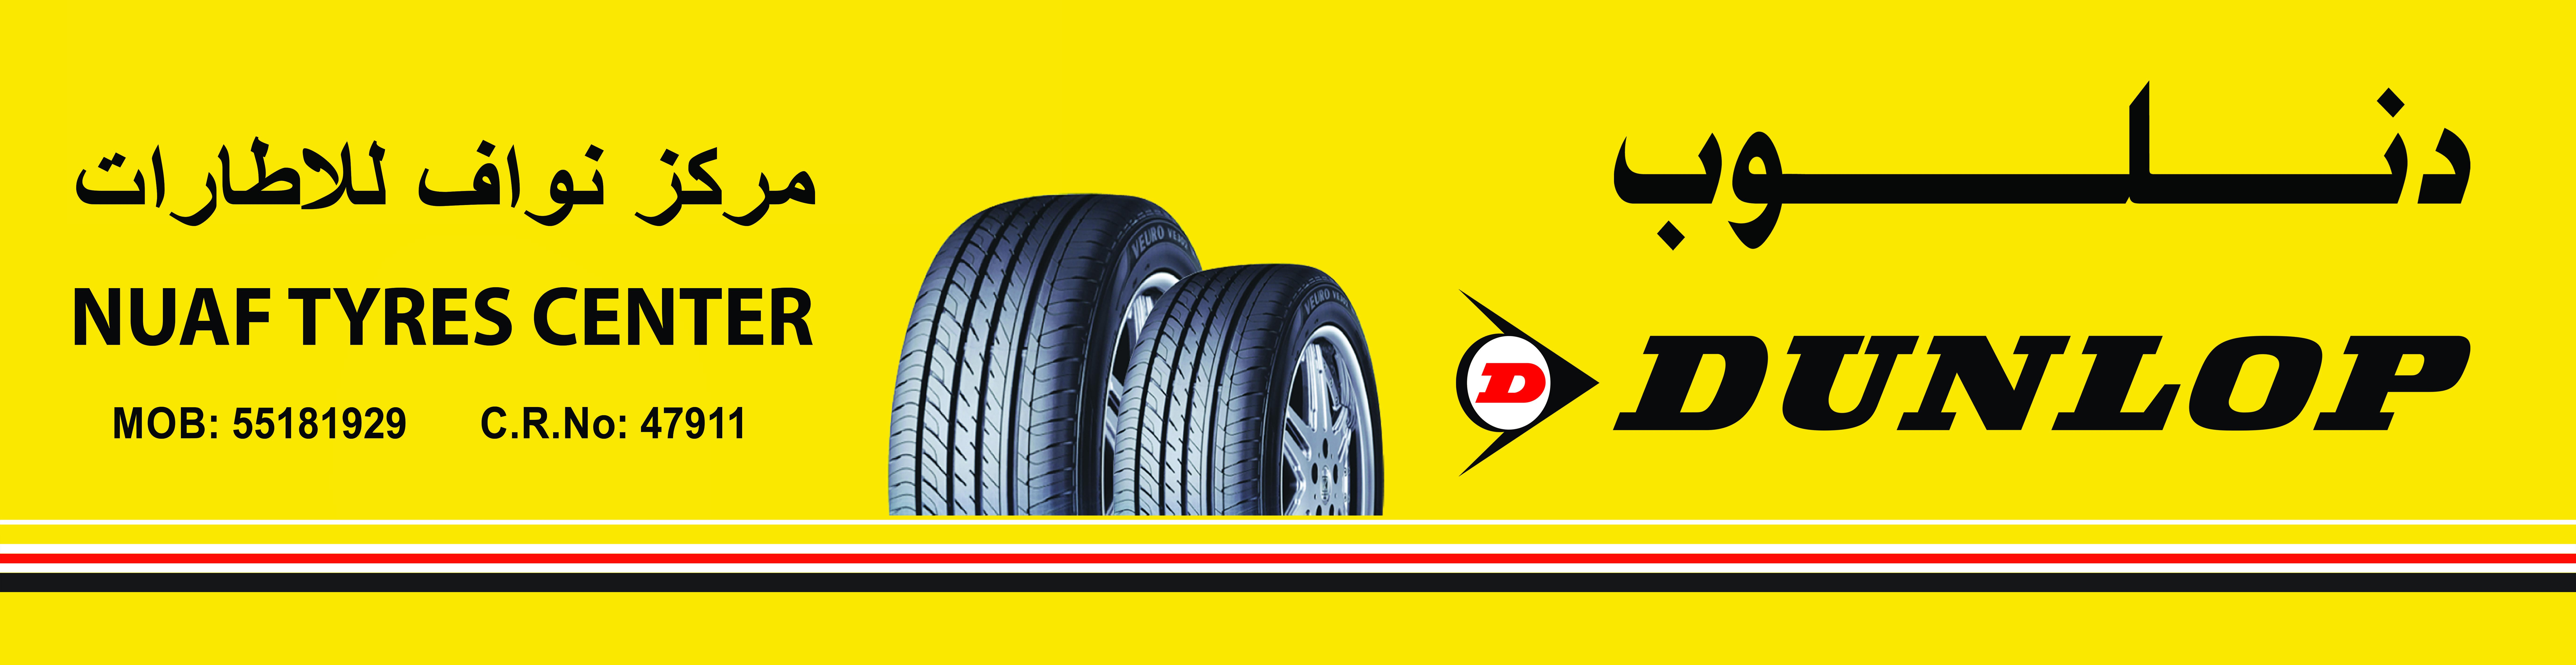 Dunlop Dunlop Signage [ 2848 x 11024 Pixel ]